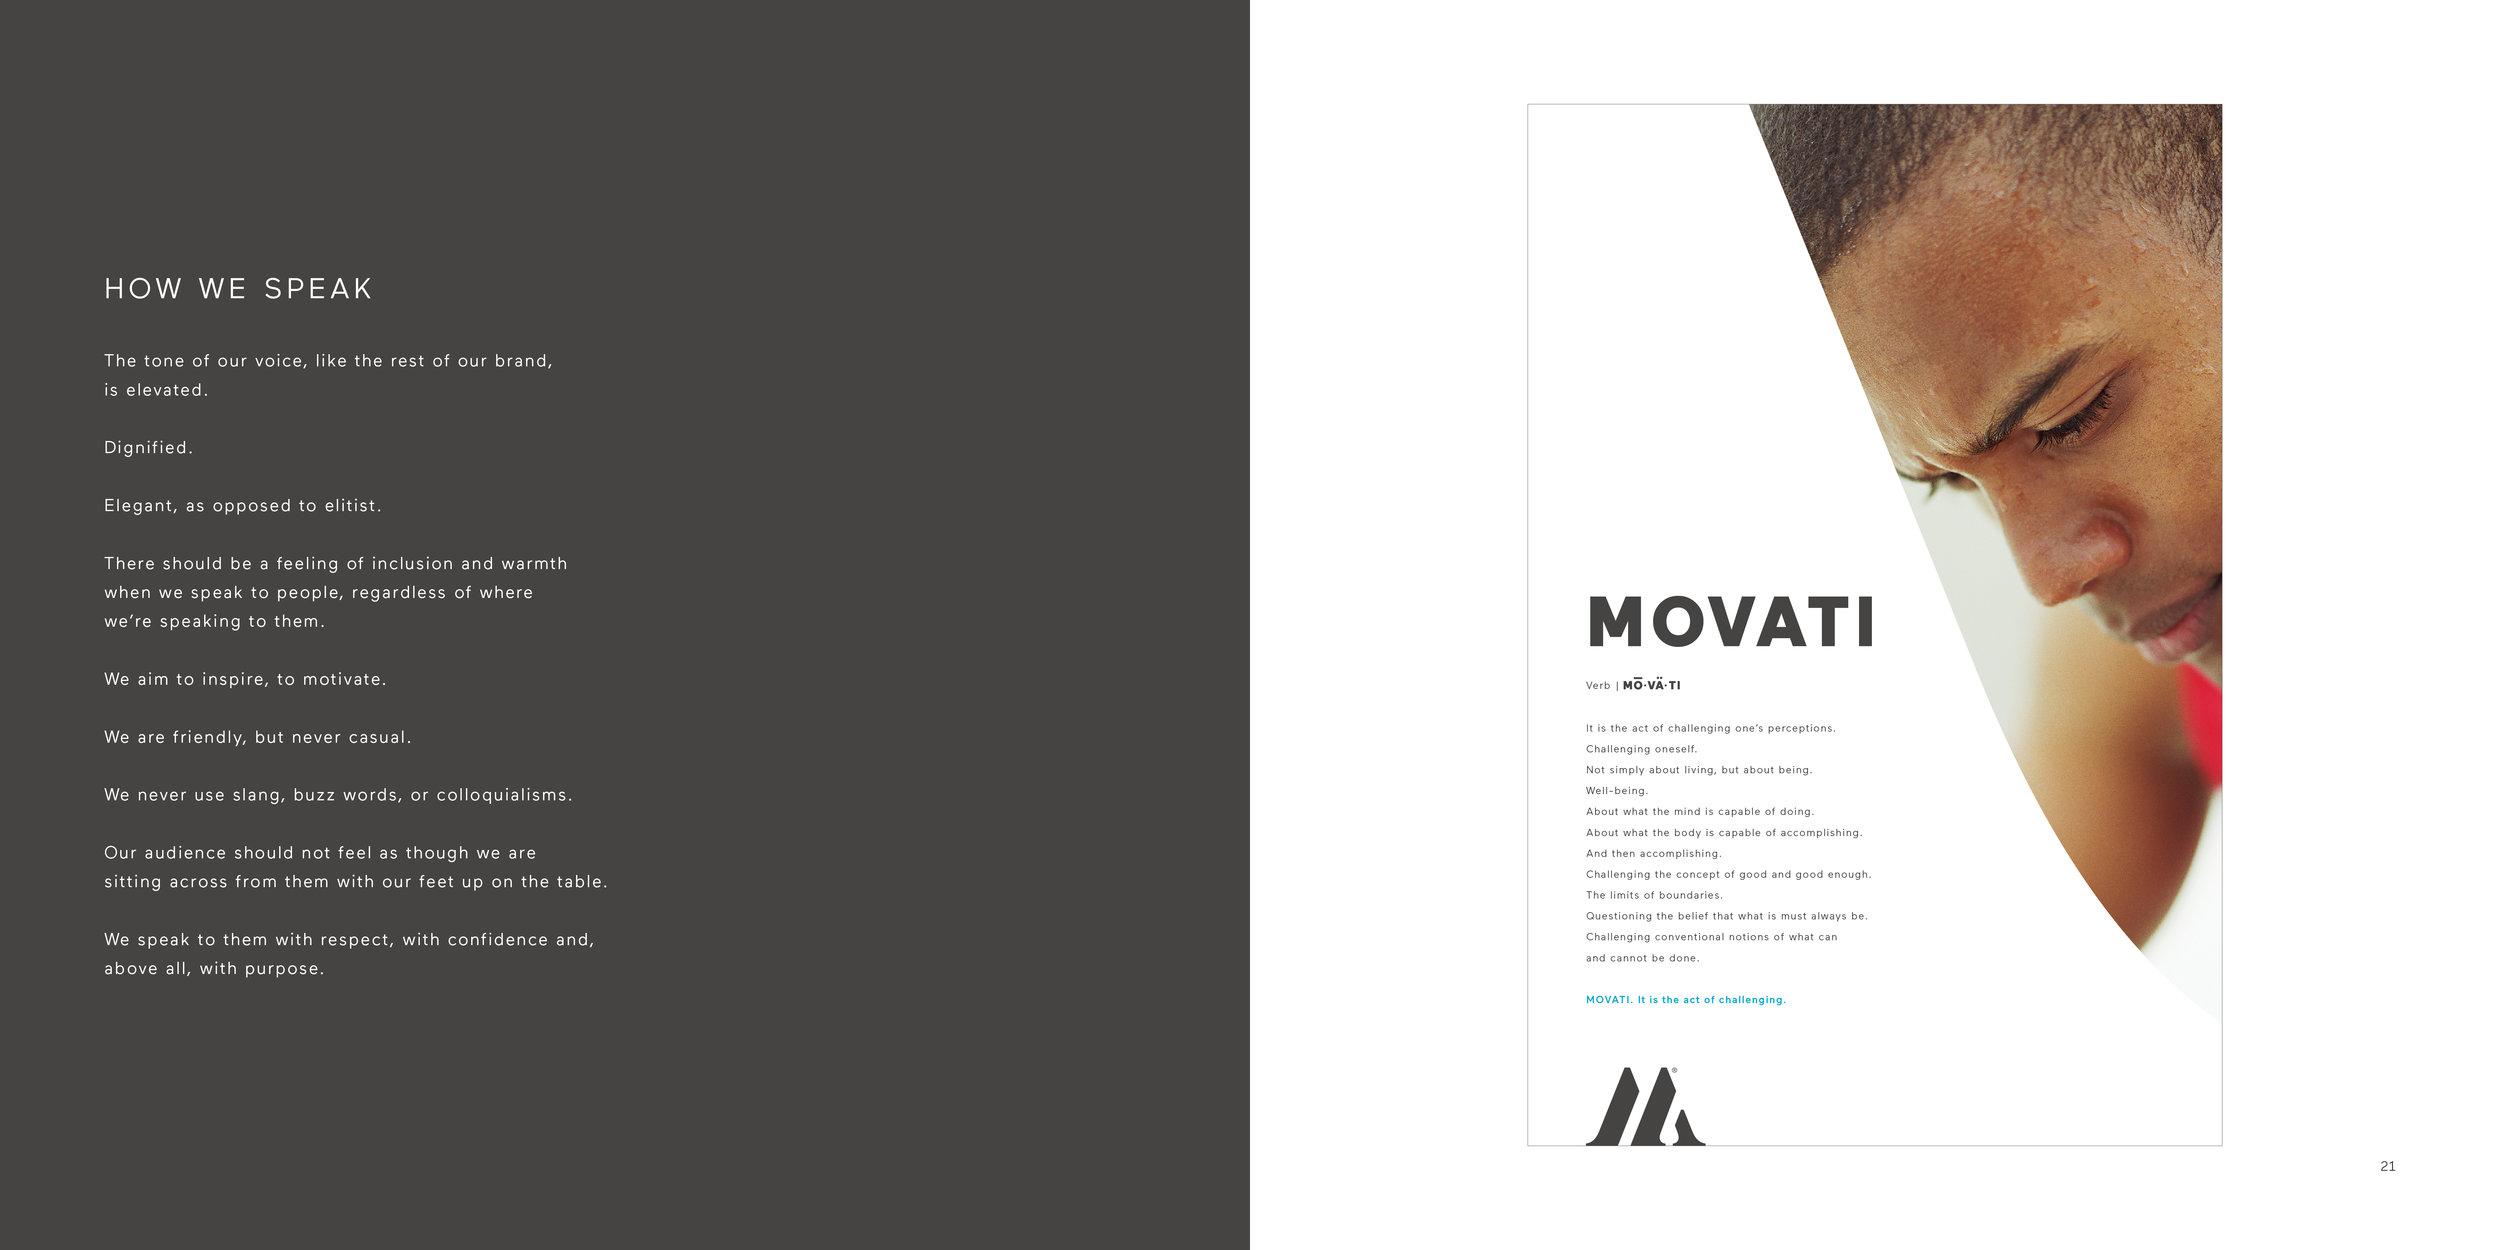 Movati_BrandGuidelines11.jpg